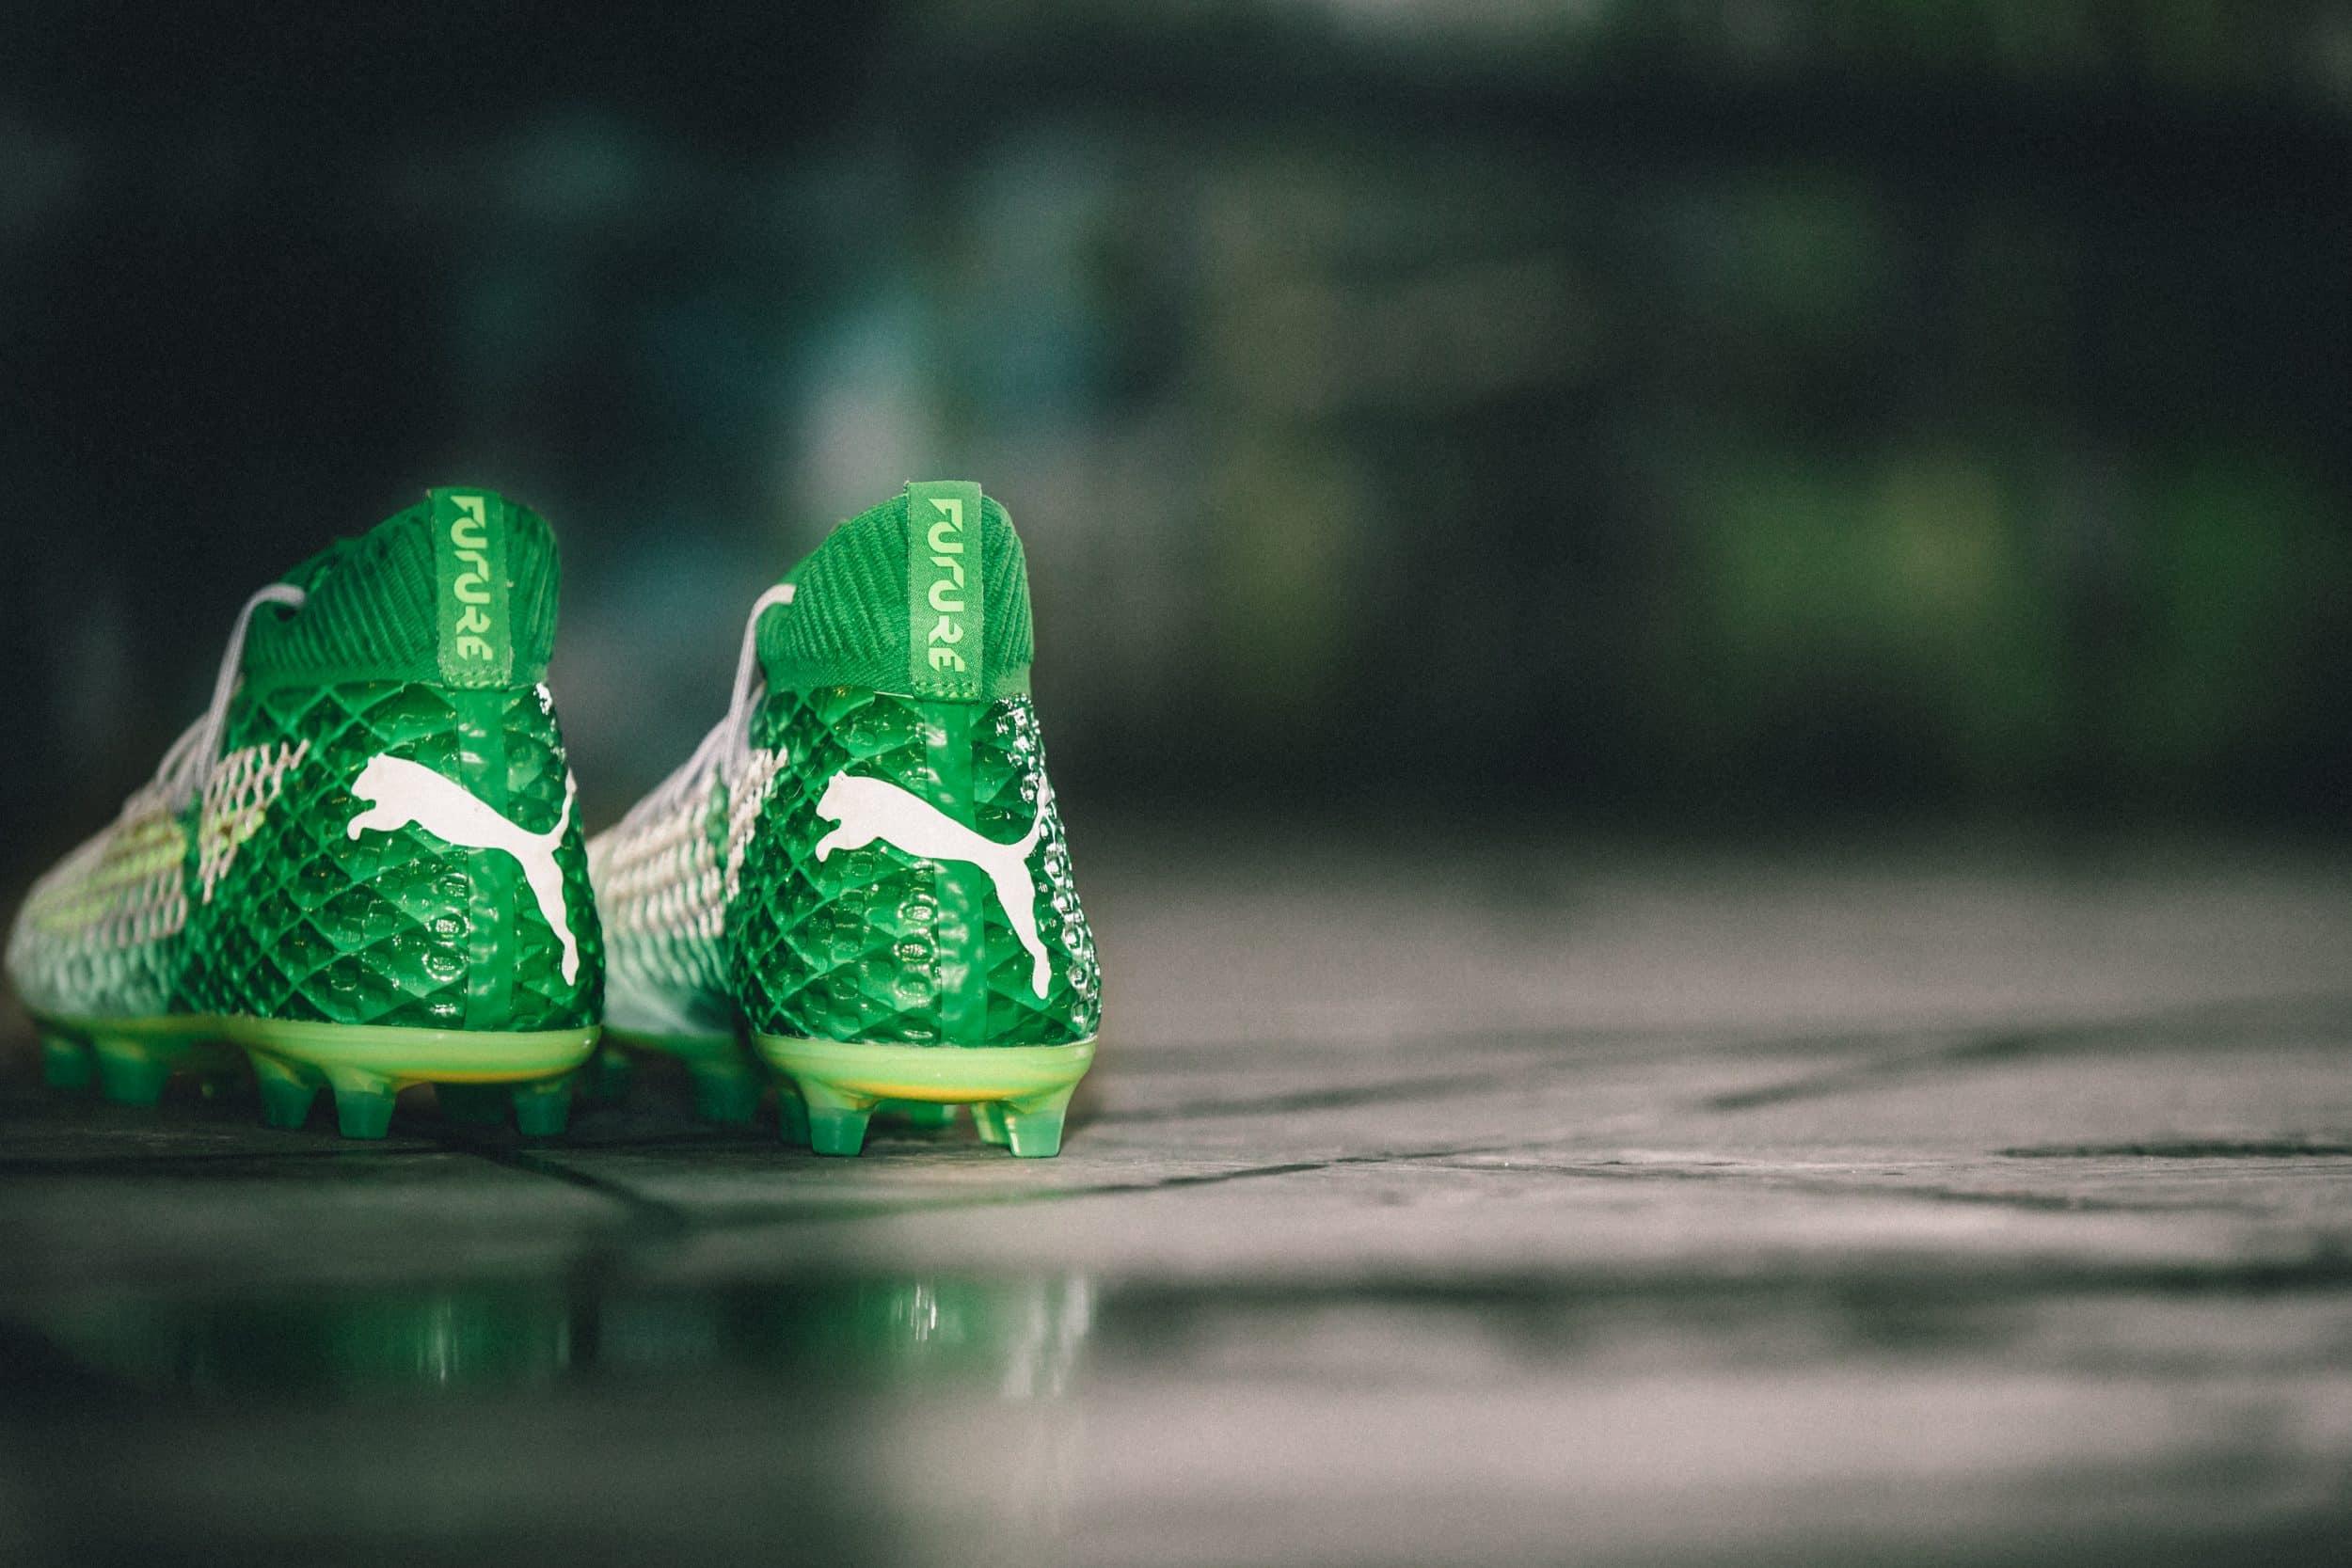 Chaussures-football-puma-future-next-mai-2018-2